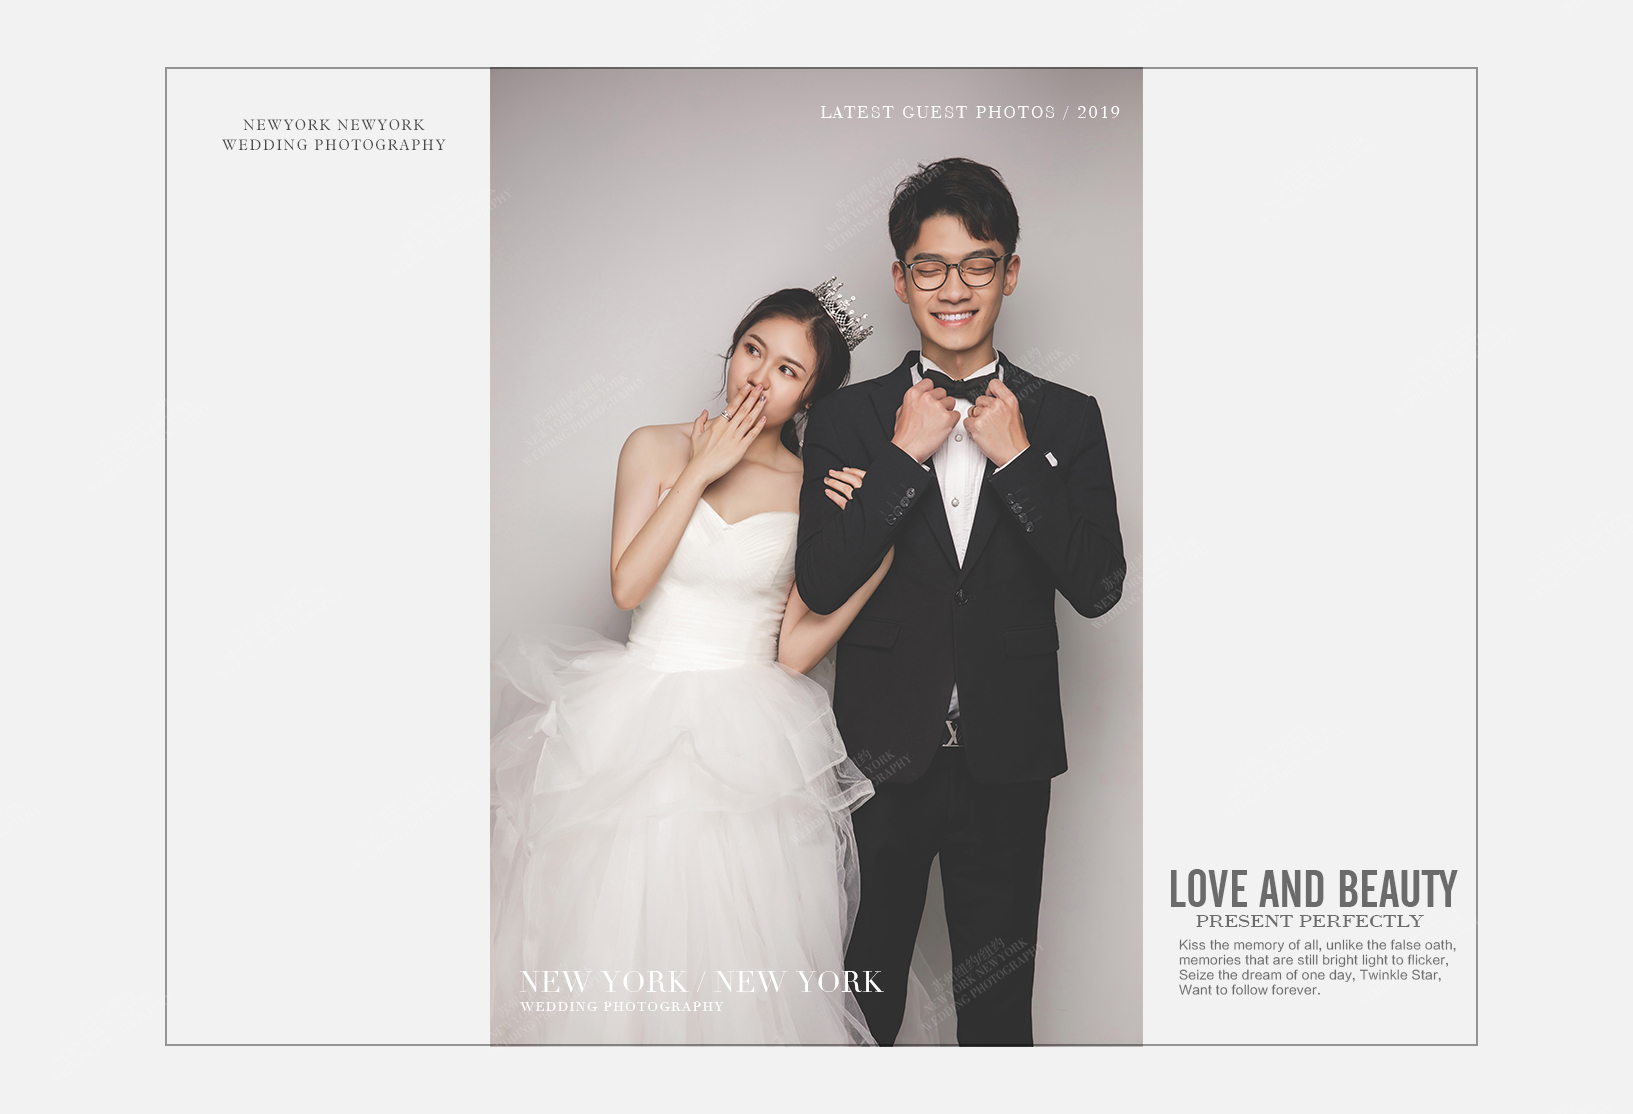 Mr.高 & Ms.卢(纽约纽约最新客照)婚纱摄影照